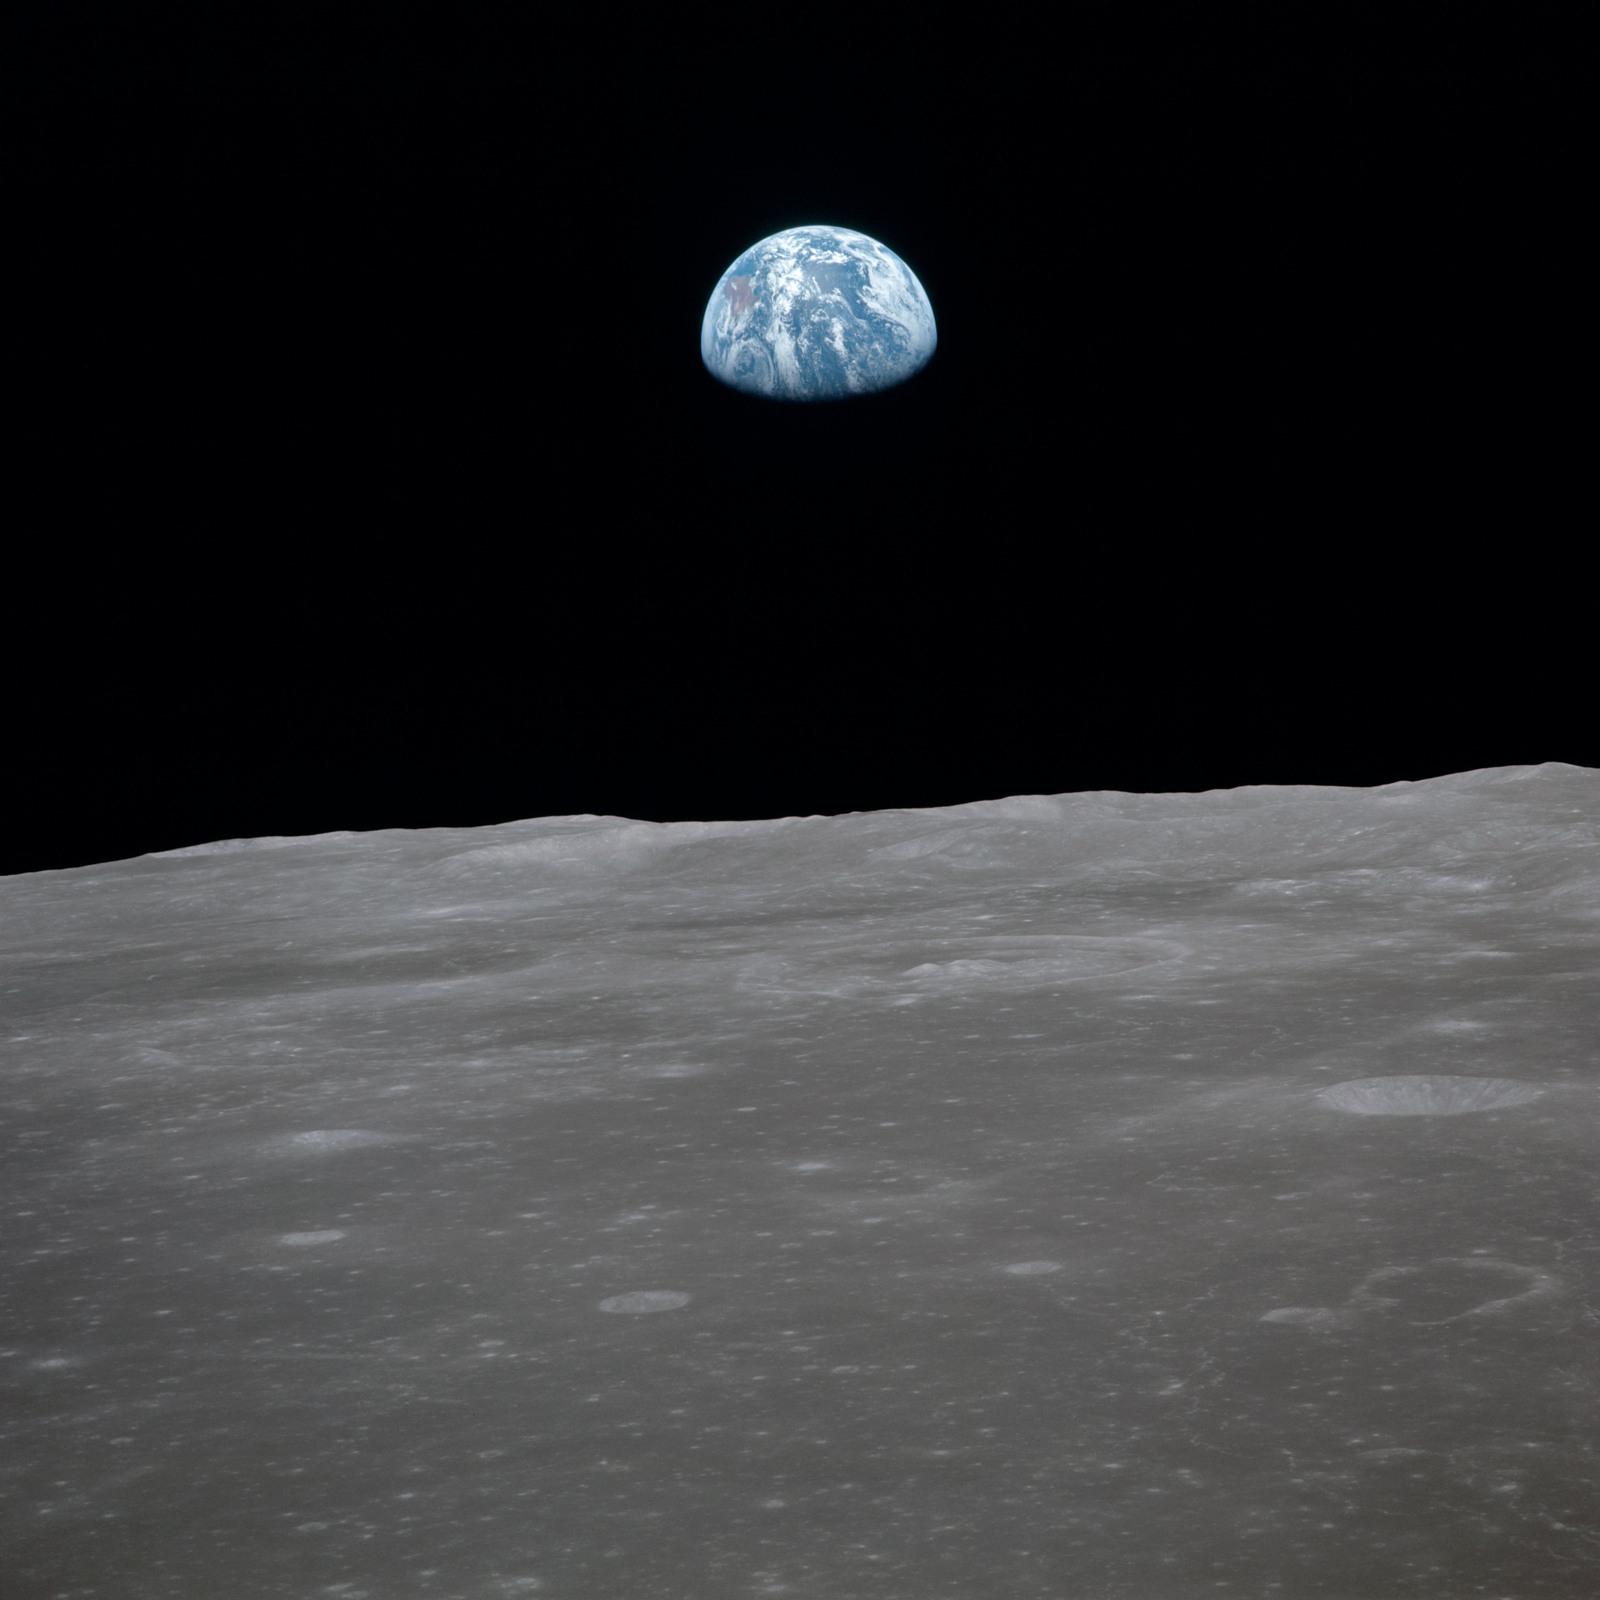 AS11-44-6562 - Apollo 11 - Apollo 11 Mission image - View of moon limb, with Earth on the horizon, Mare Smythii Region